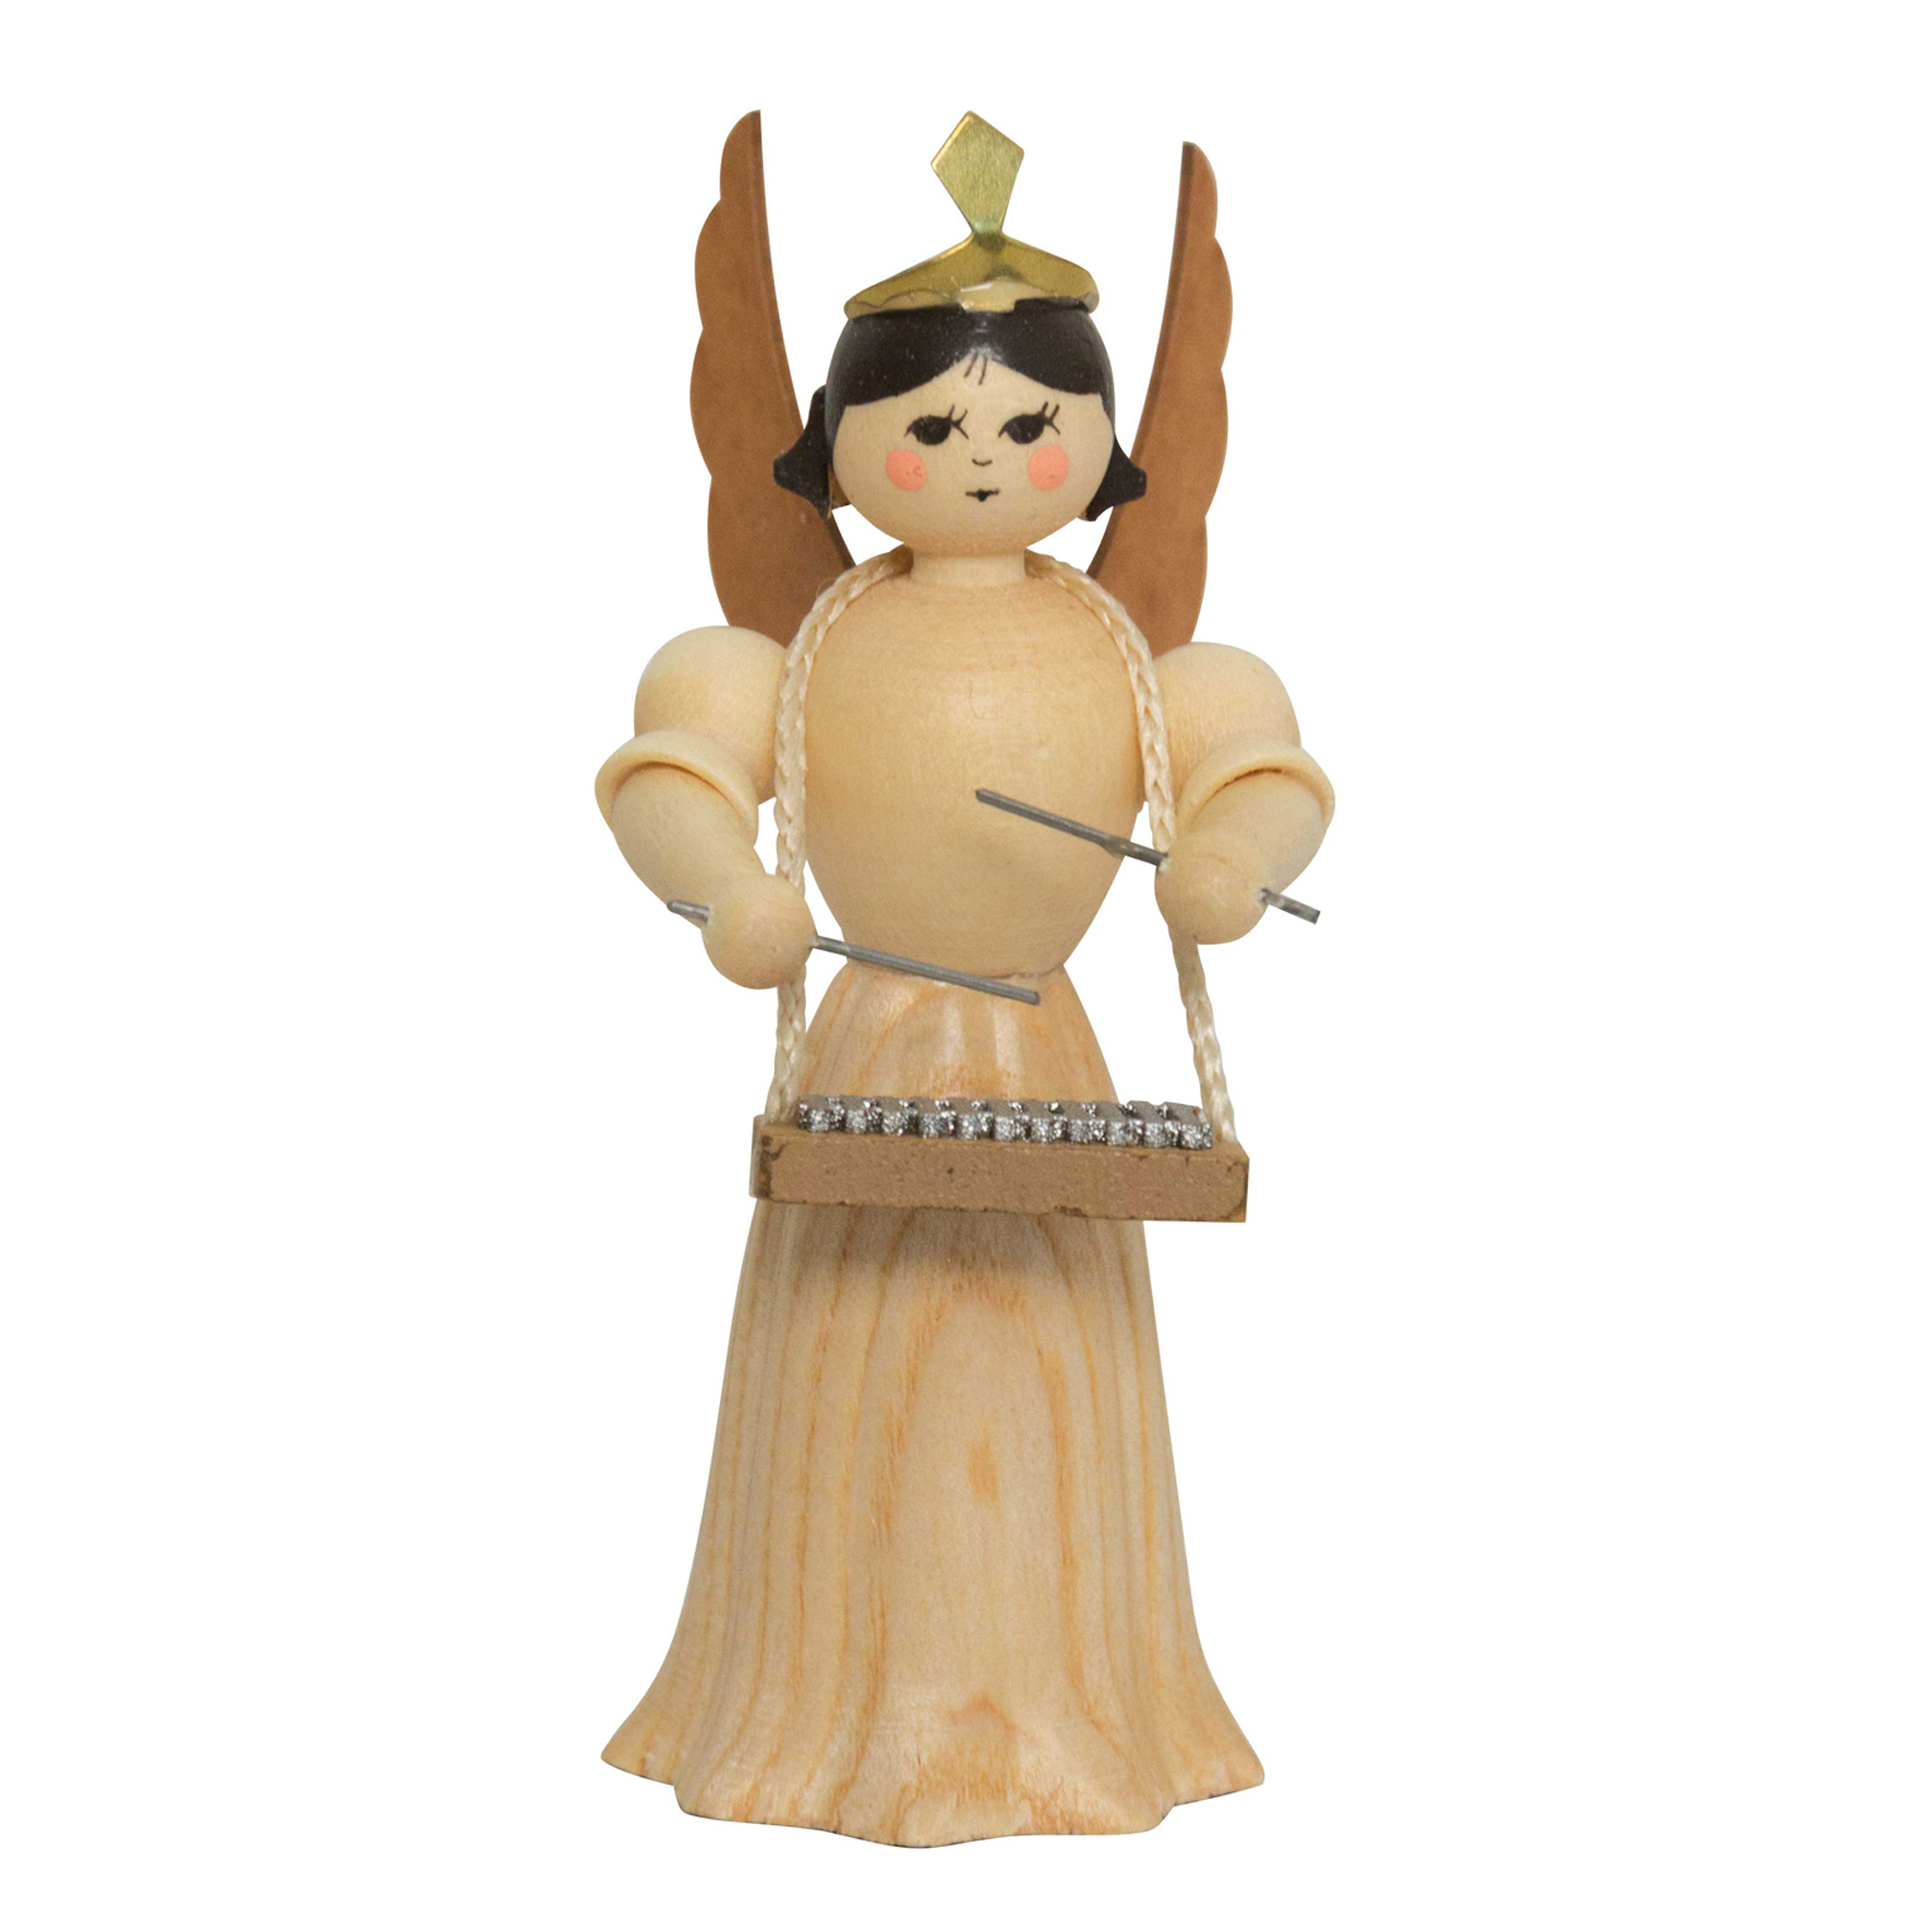 Engel mit Xylophon, 7cm